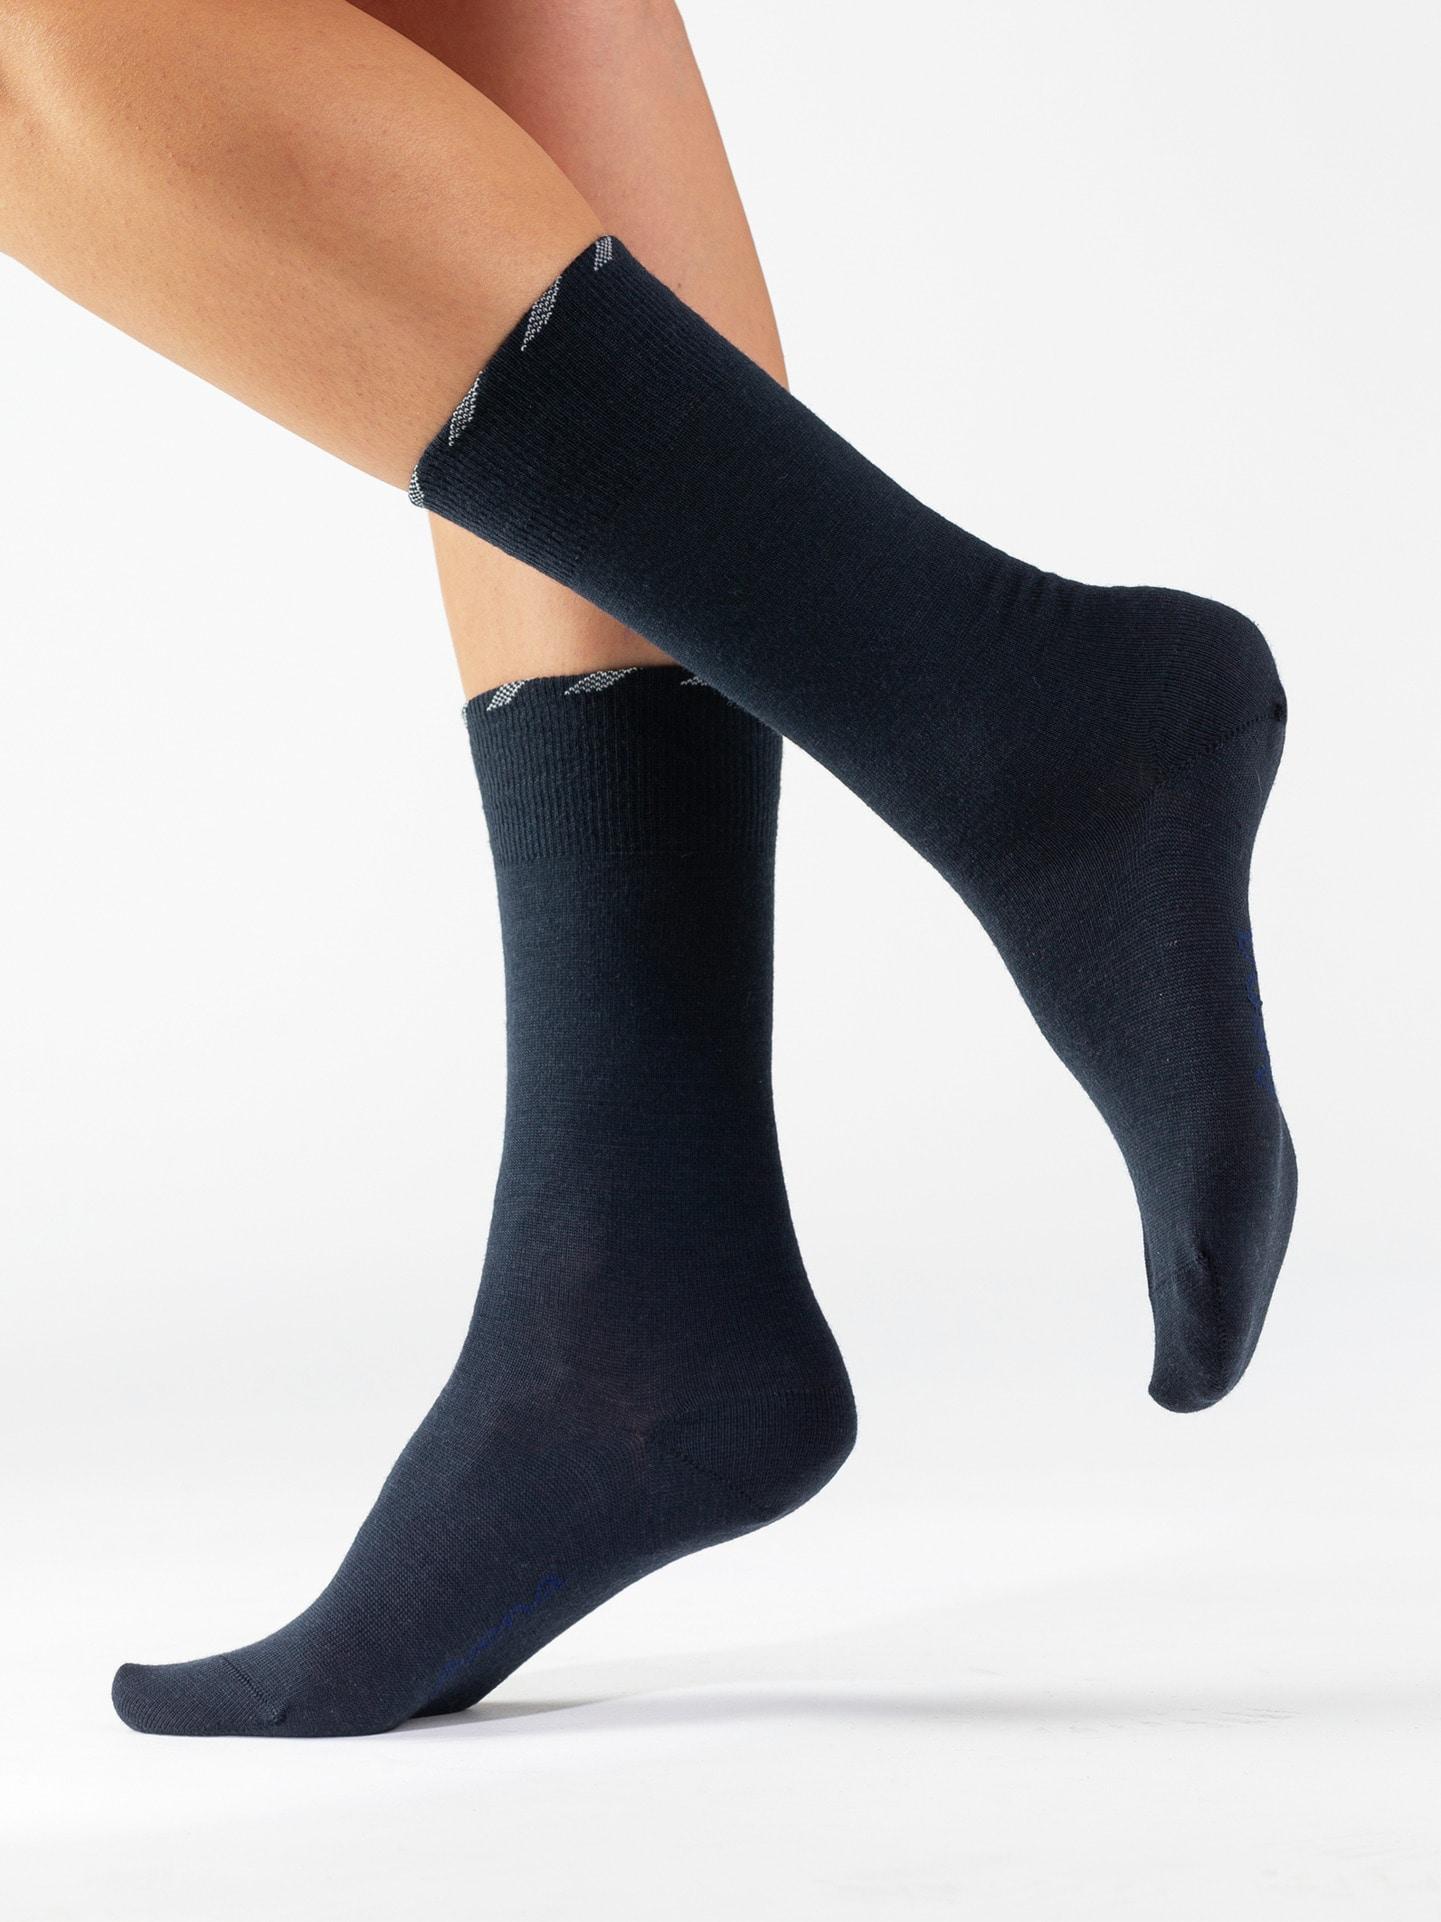 Avena Herren Lambswool-Socke antibakt. 2 Paar Blau 21-5087-9